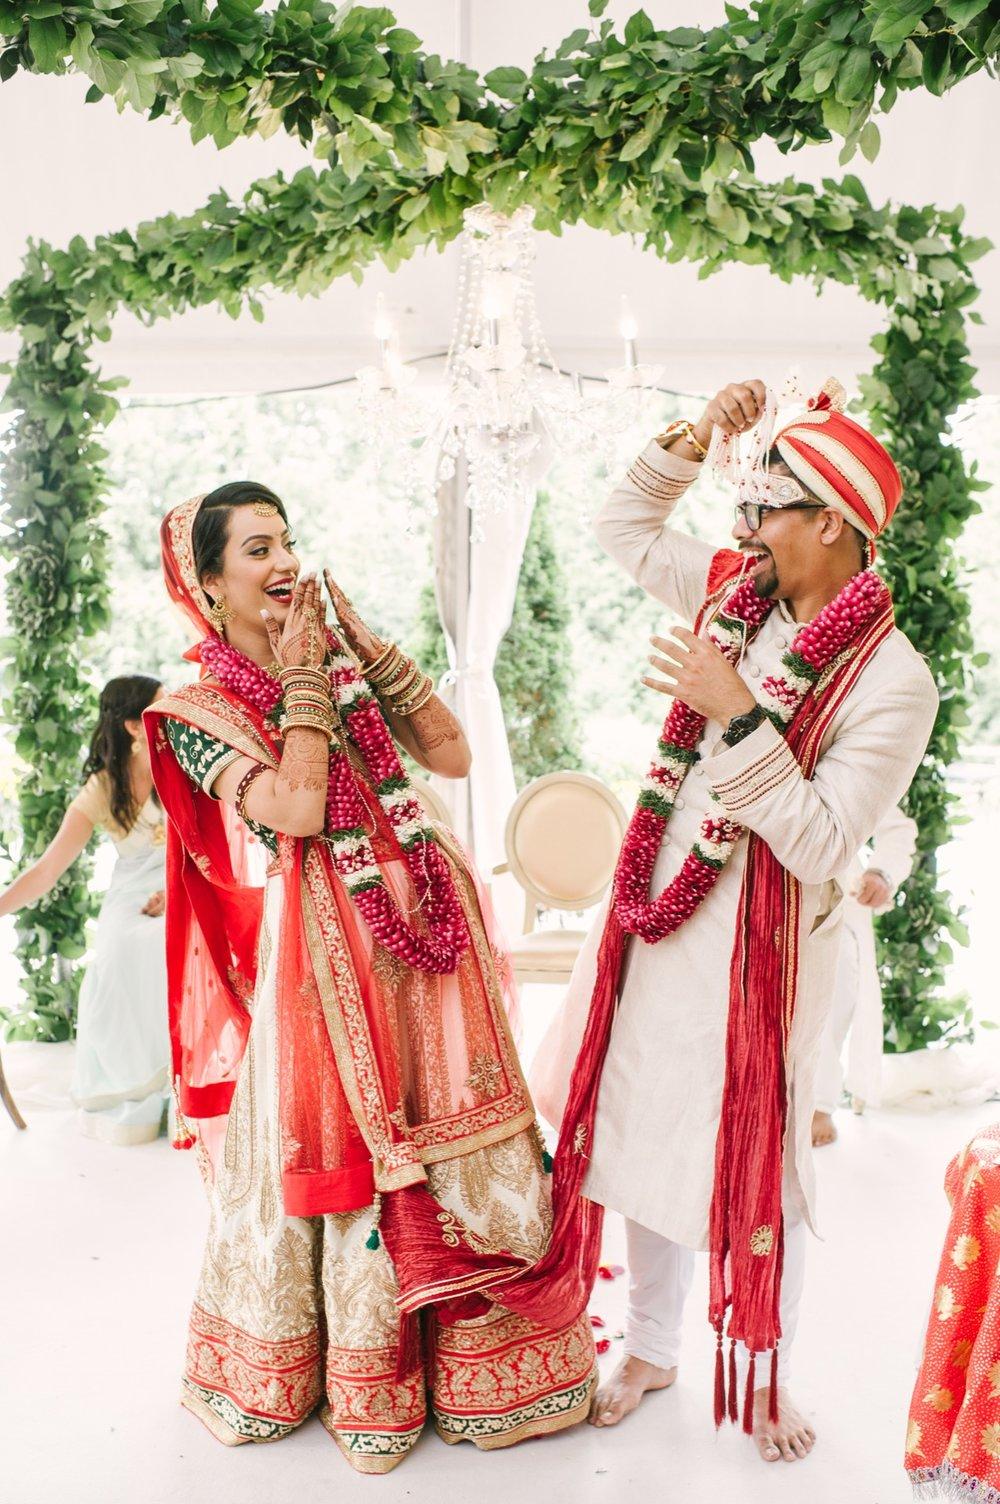 vickita-dj-wedding-674.jpg